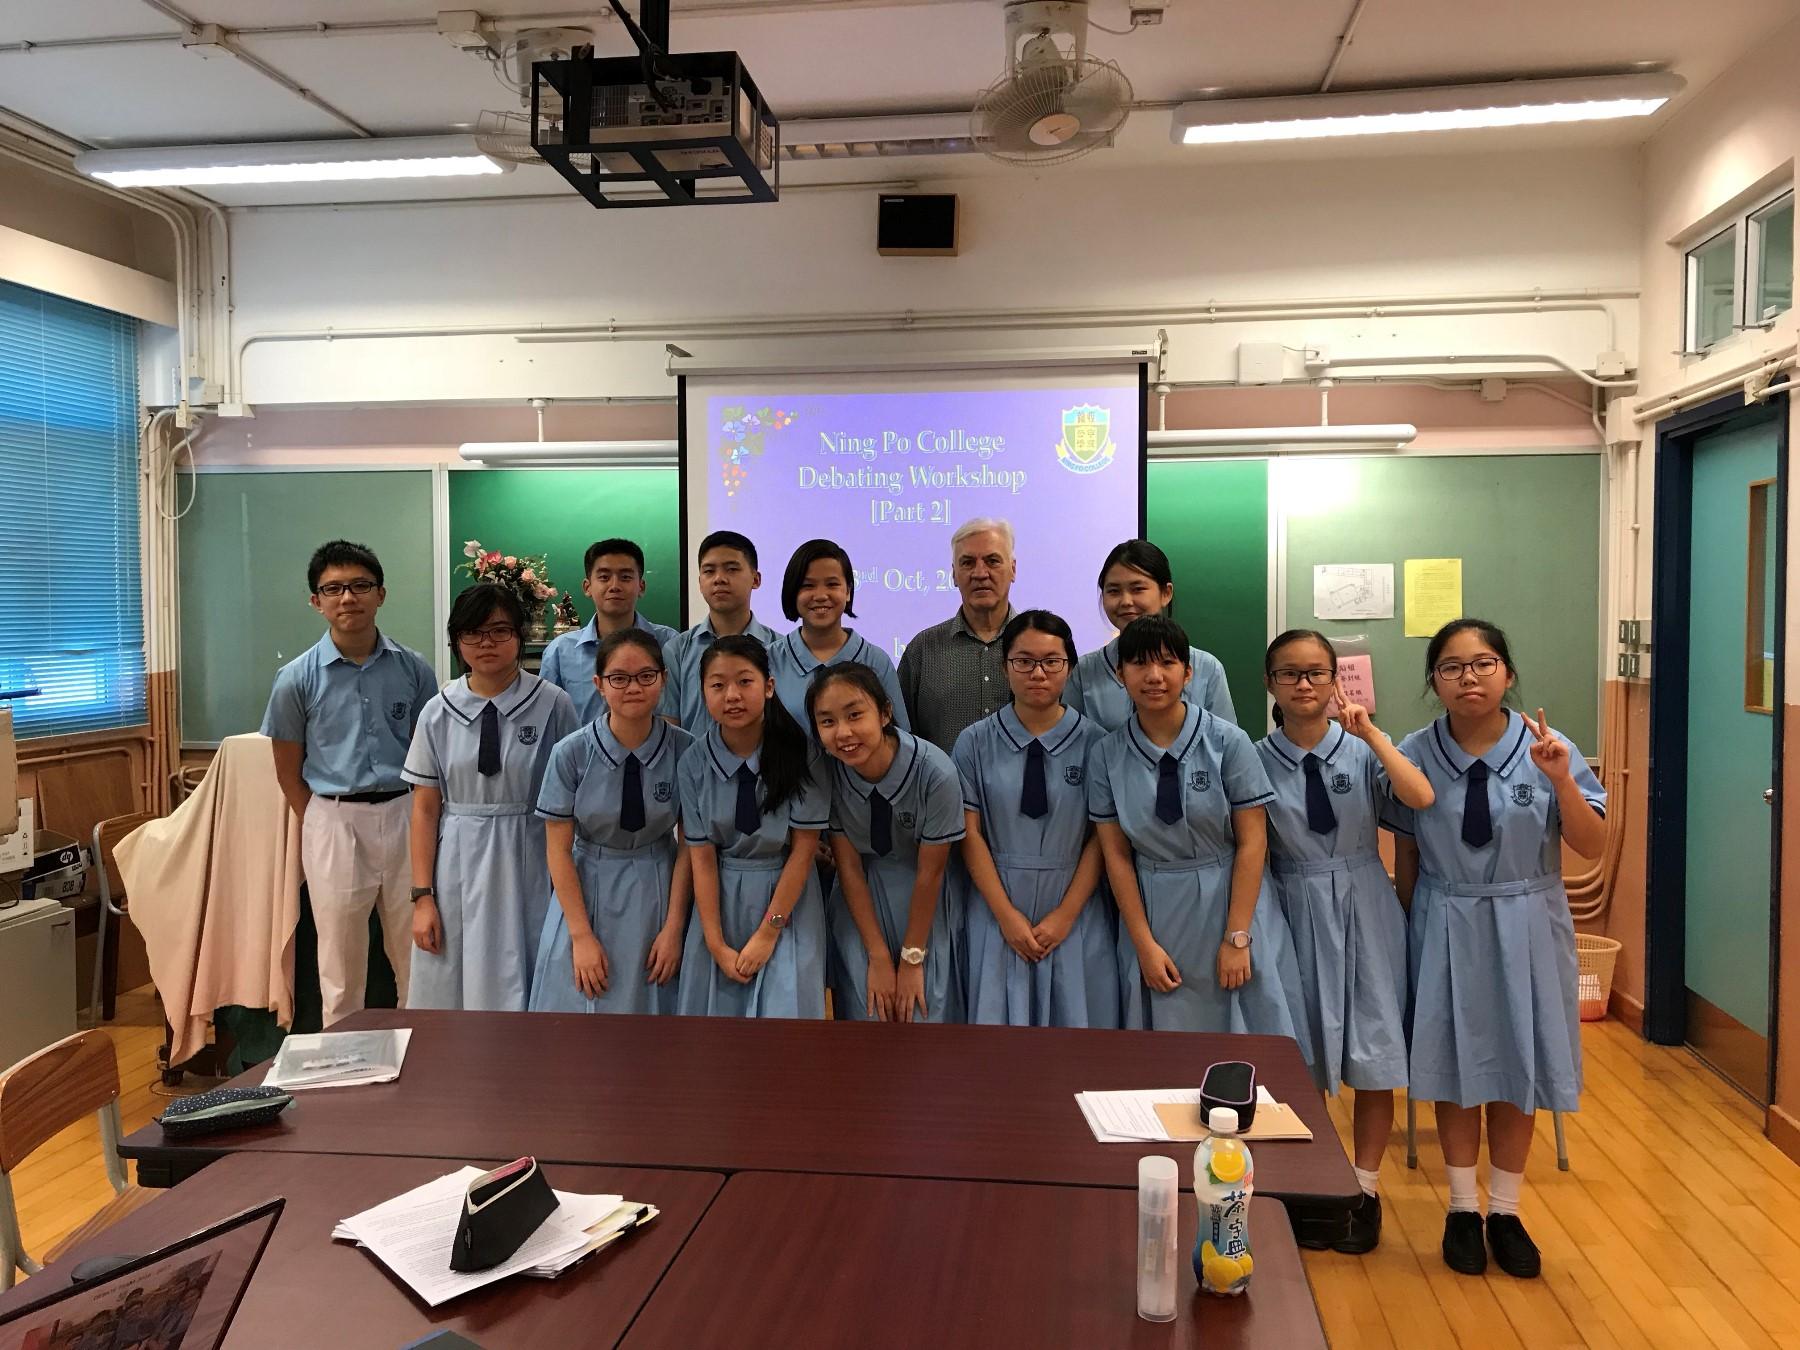 http://npc.edu.hk/sites/default/files/img_4530.jpg